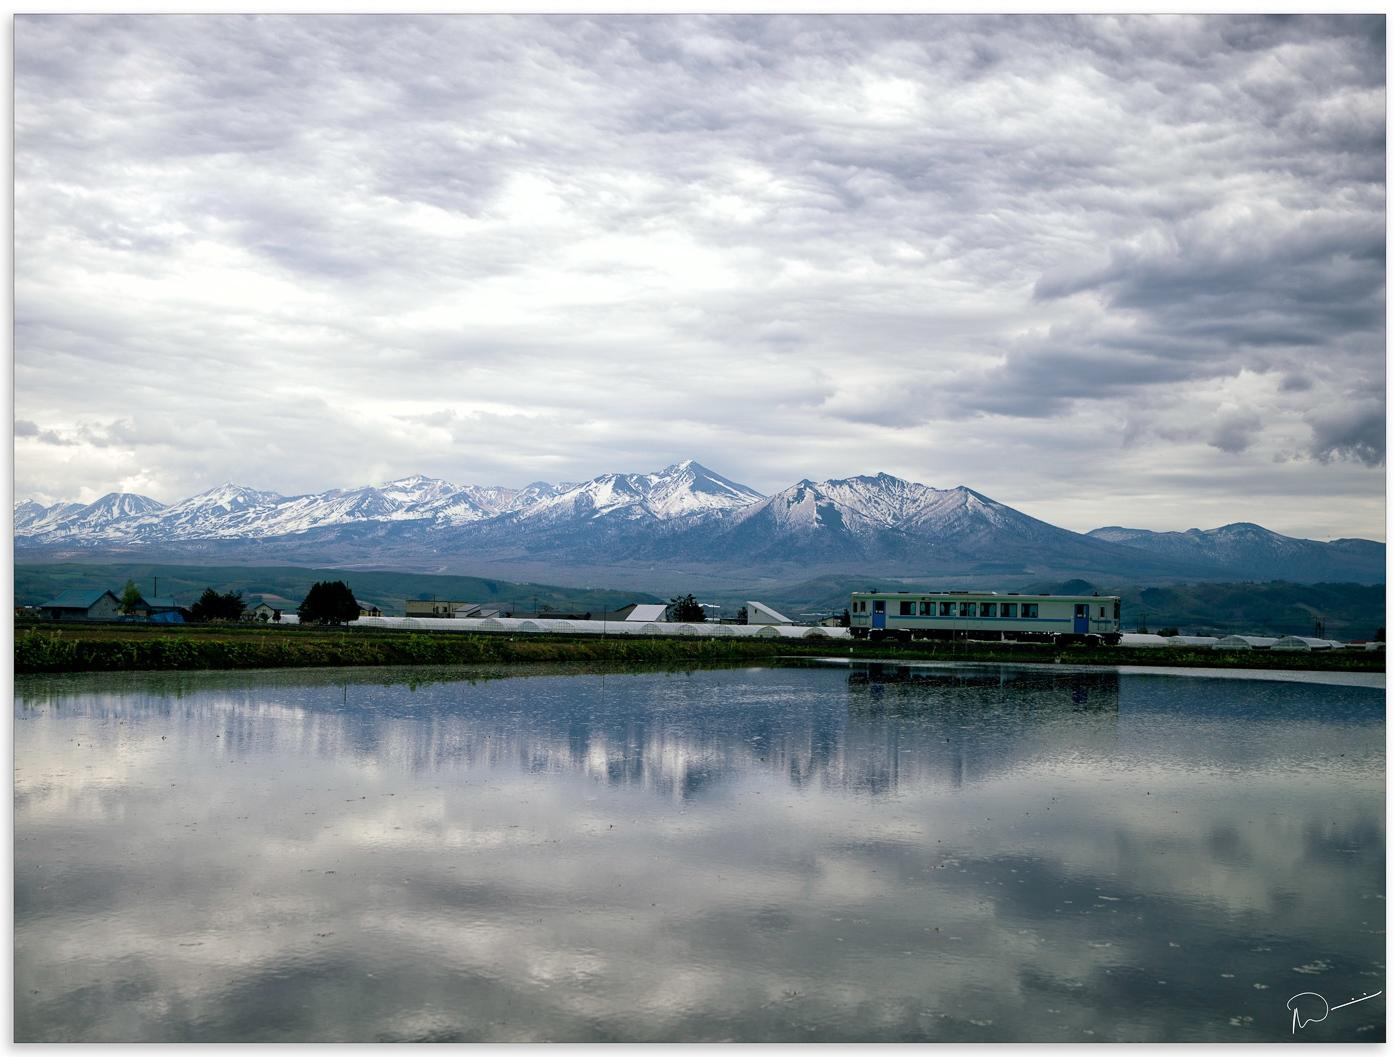 Neils-Photography-Japan-2019-0005676-Edit-Edit